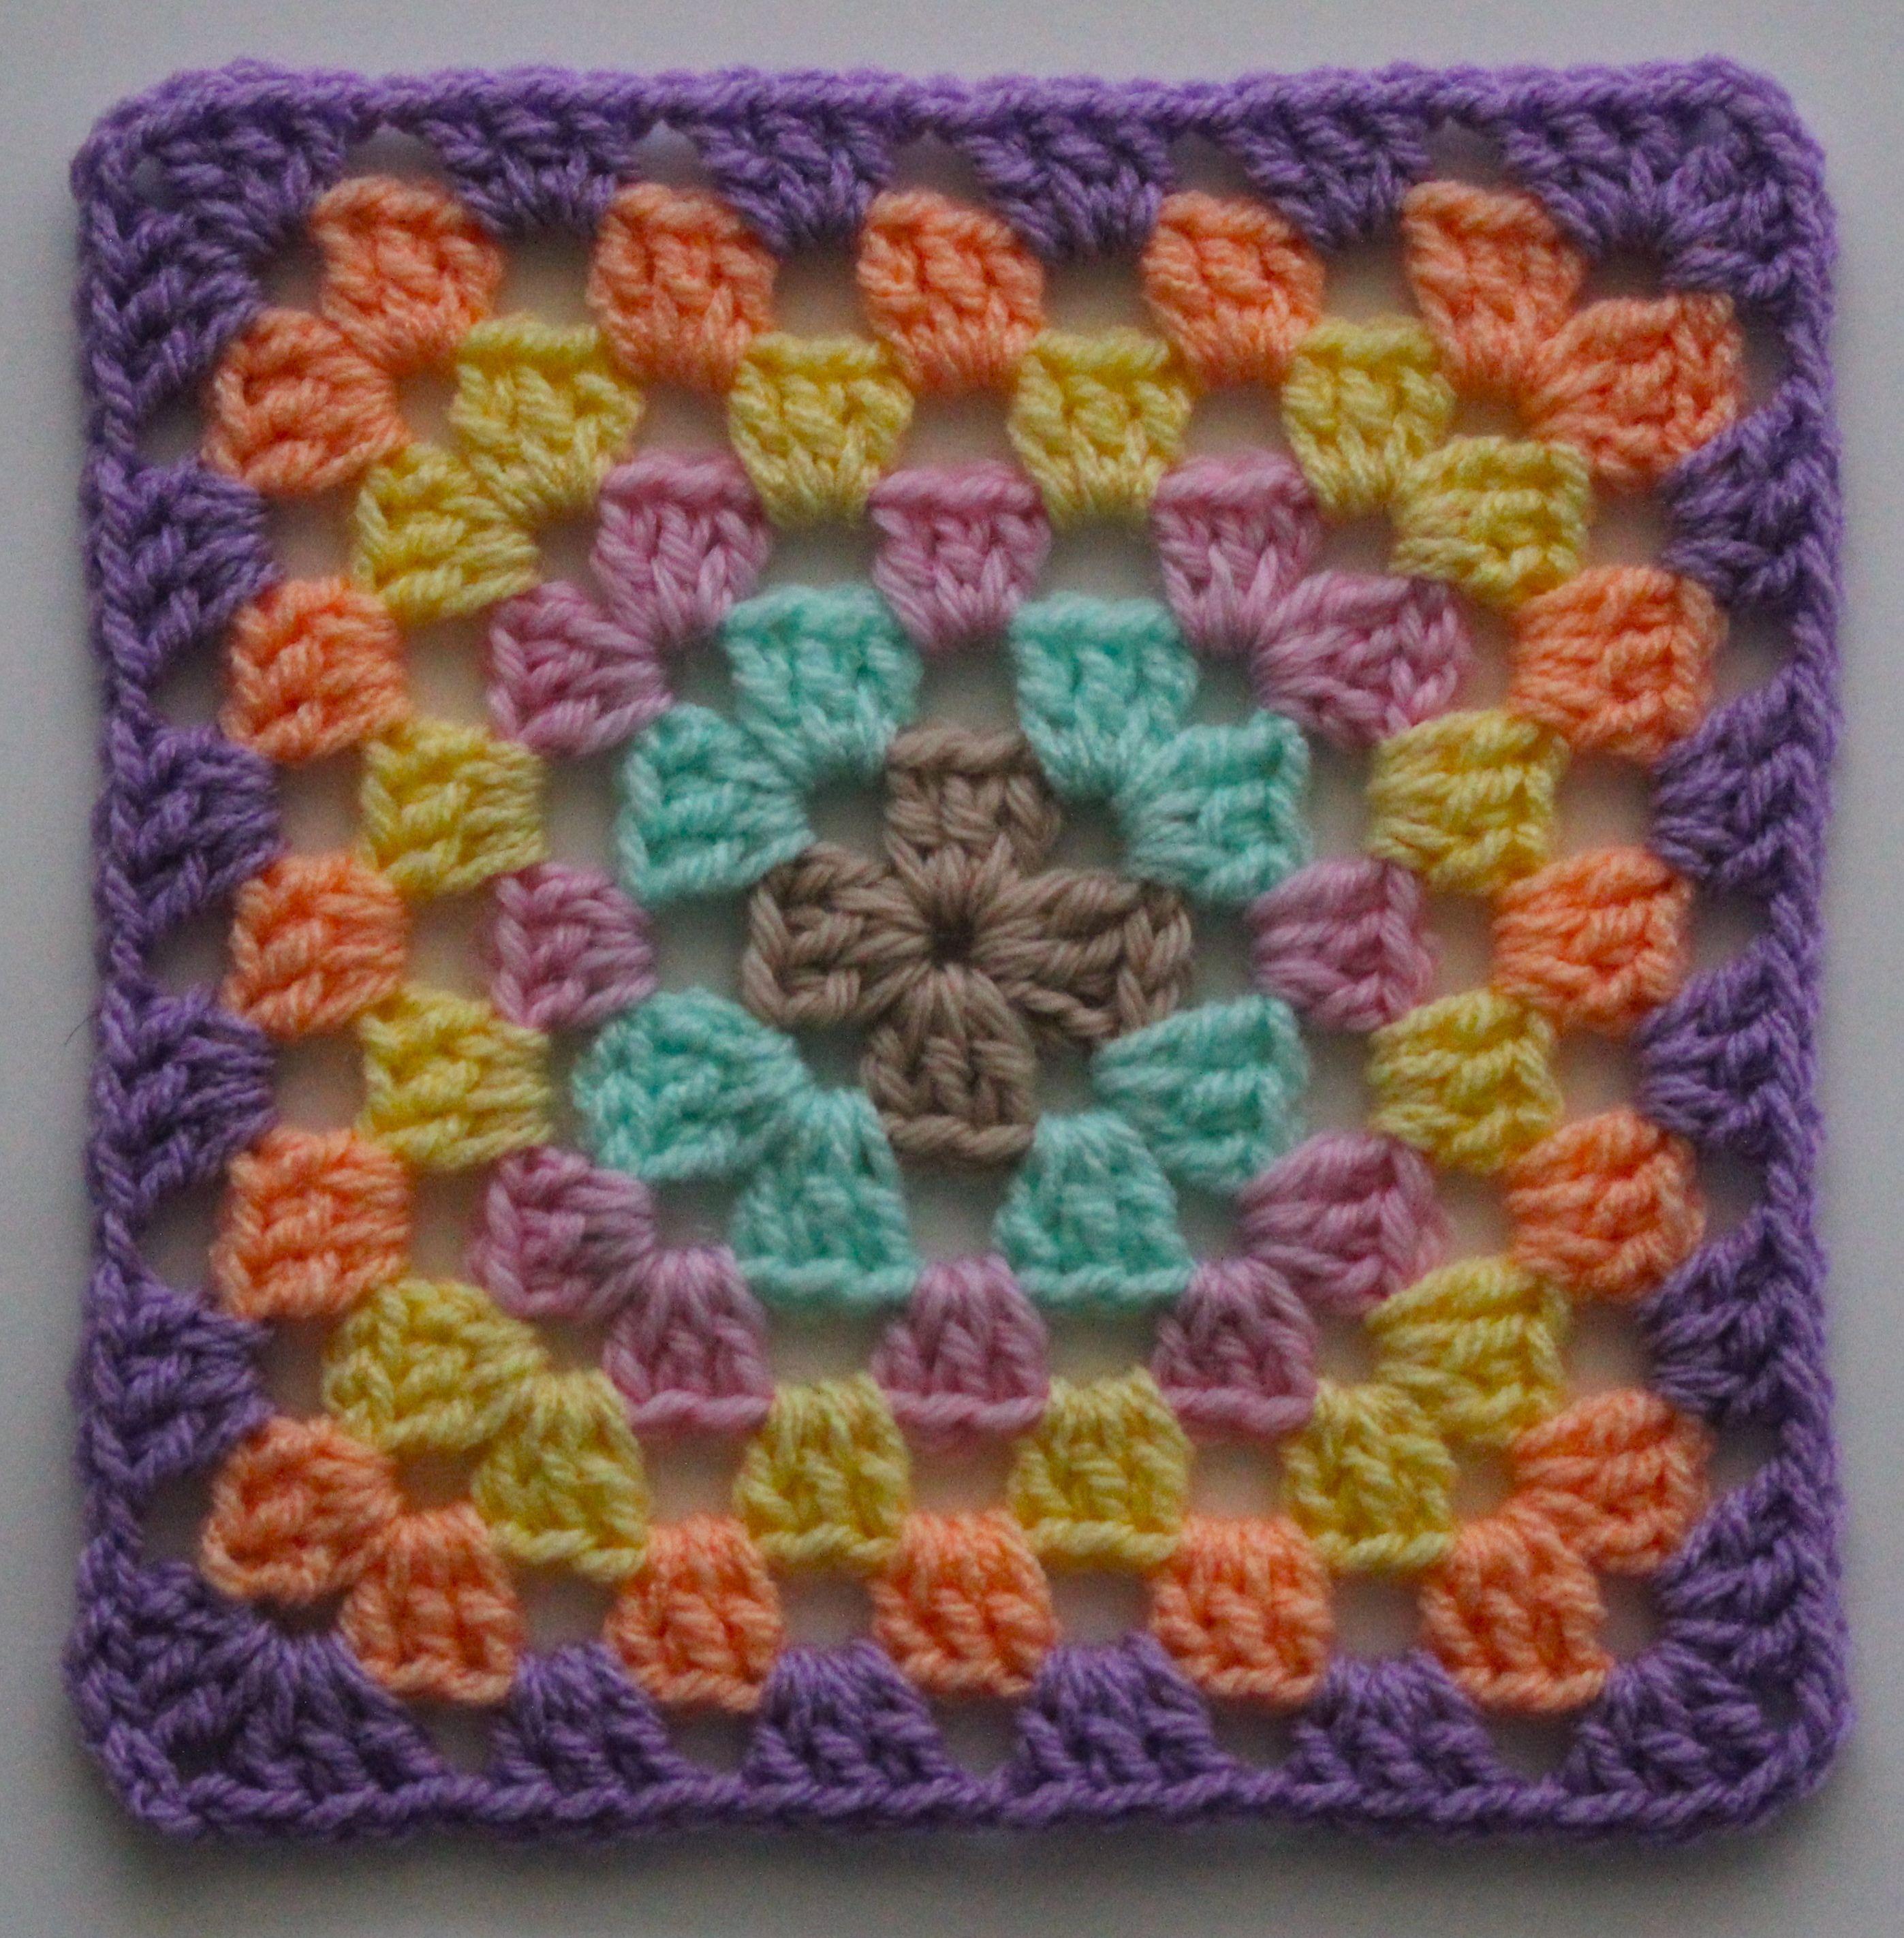 Free Motif Monday Basic Granny Square Granny Square Crochet Pattern Crochet Square Patterns Granny Square Pattern Free